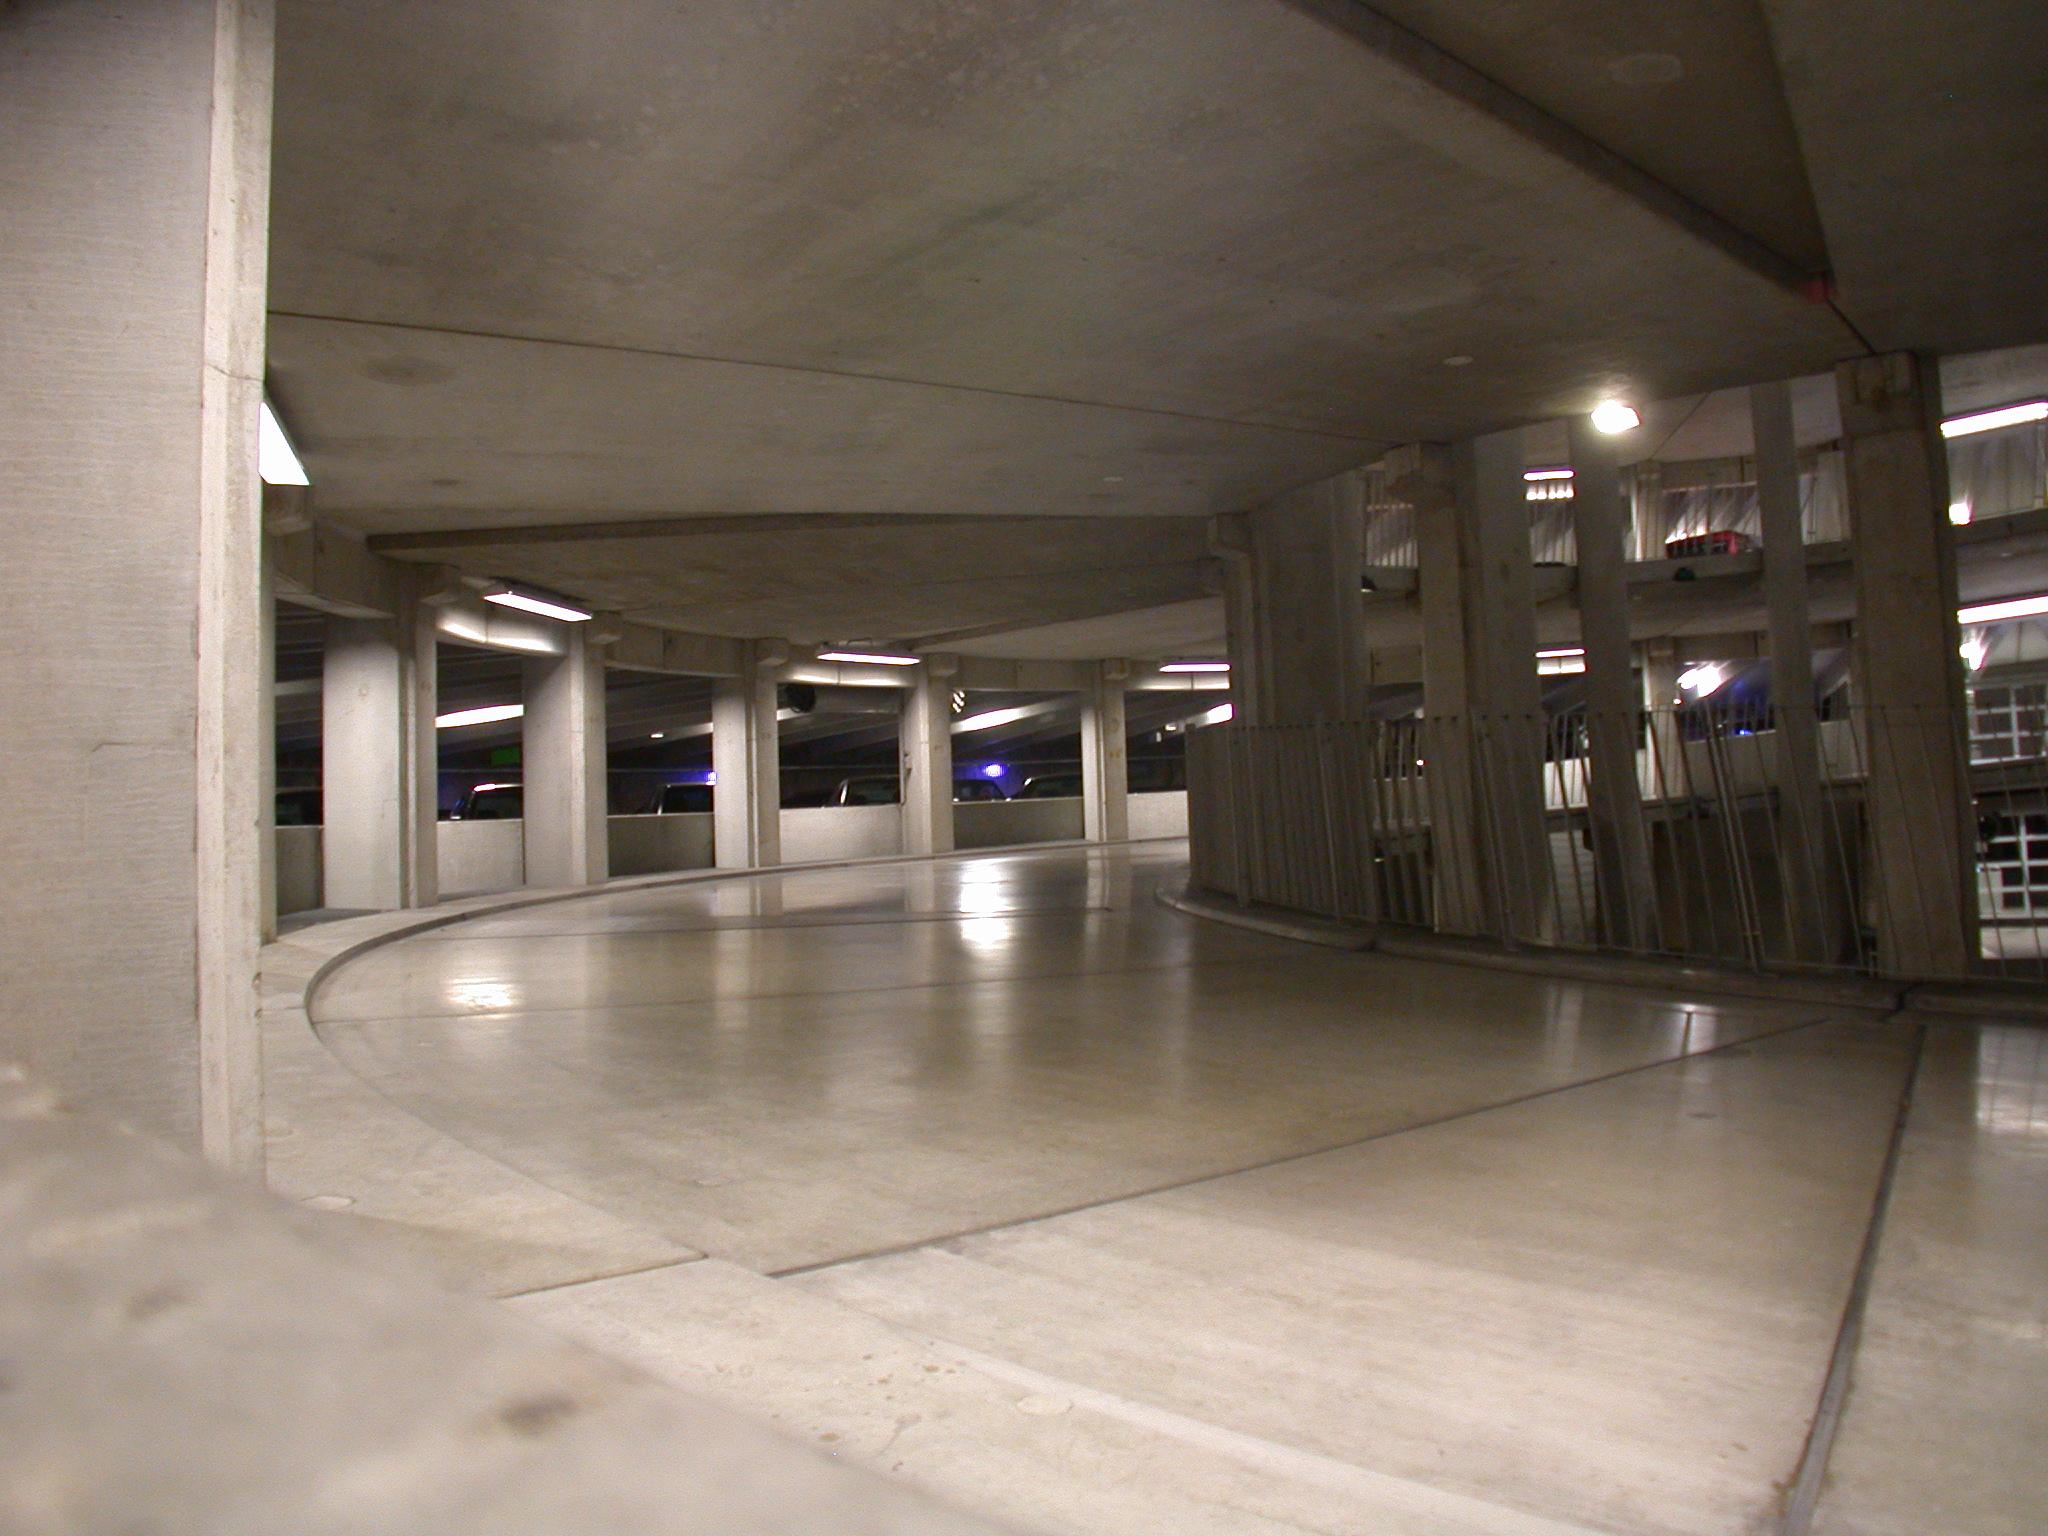 car park carpark parking floor empty space columns slippery floor glossy